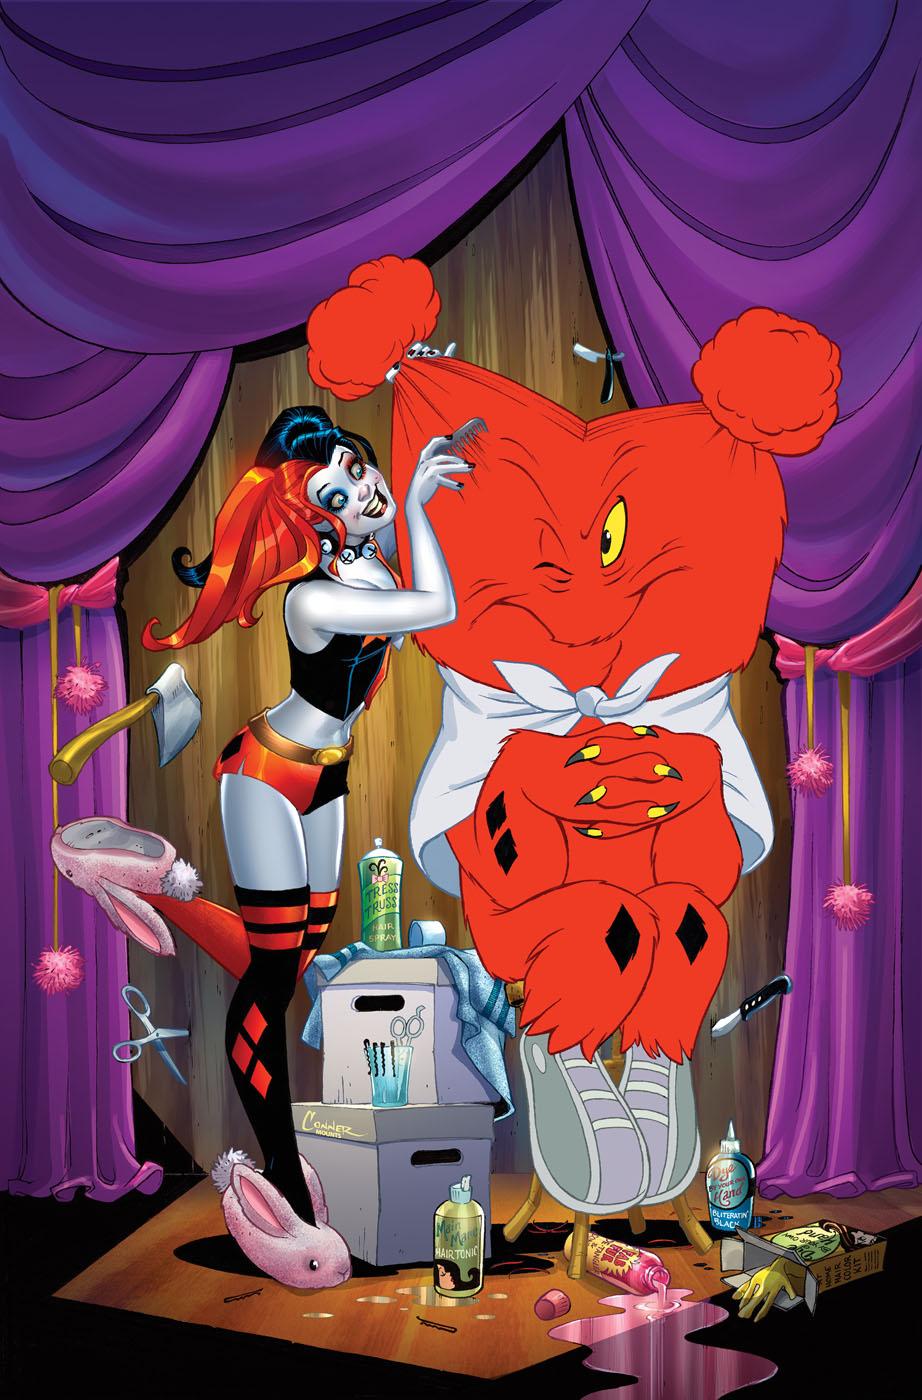 Harley Quinn Vol 2 22 Textless Looney Tunes Variant.jpg